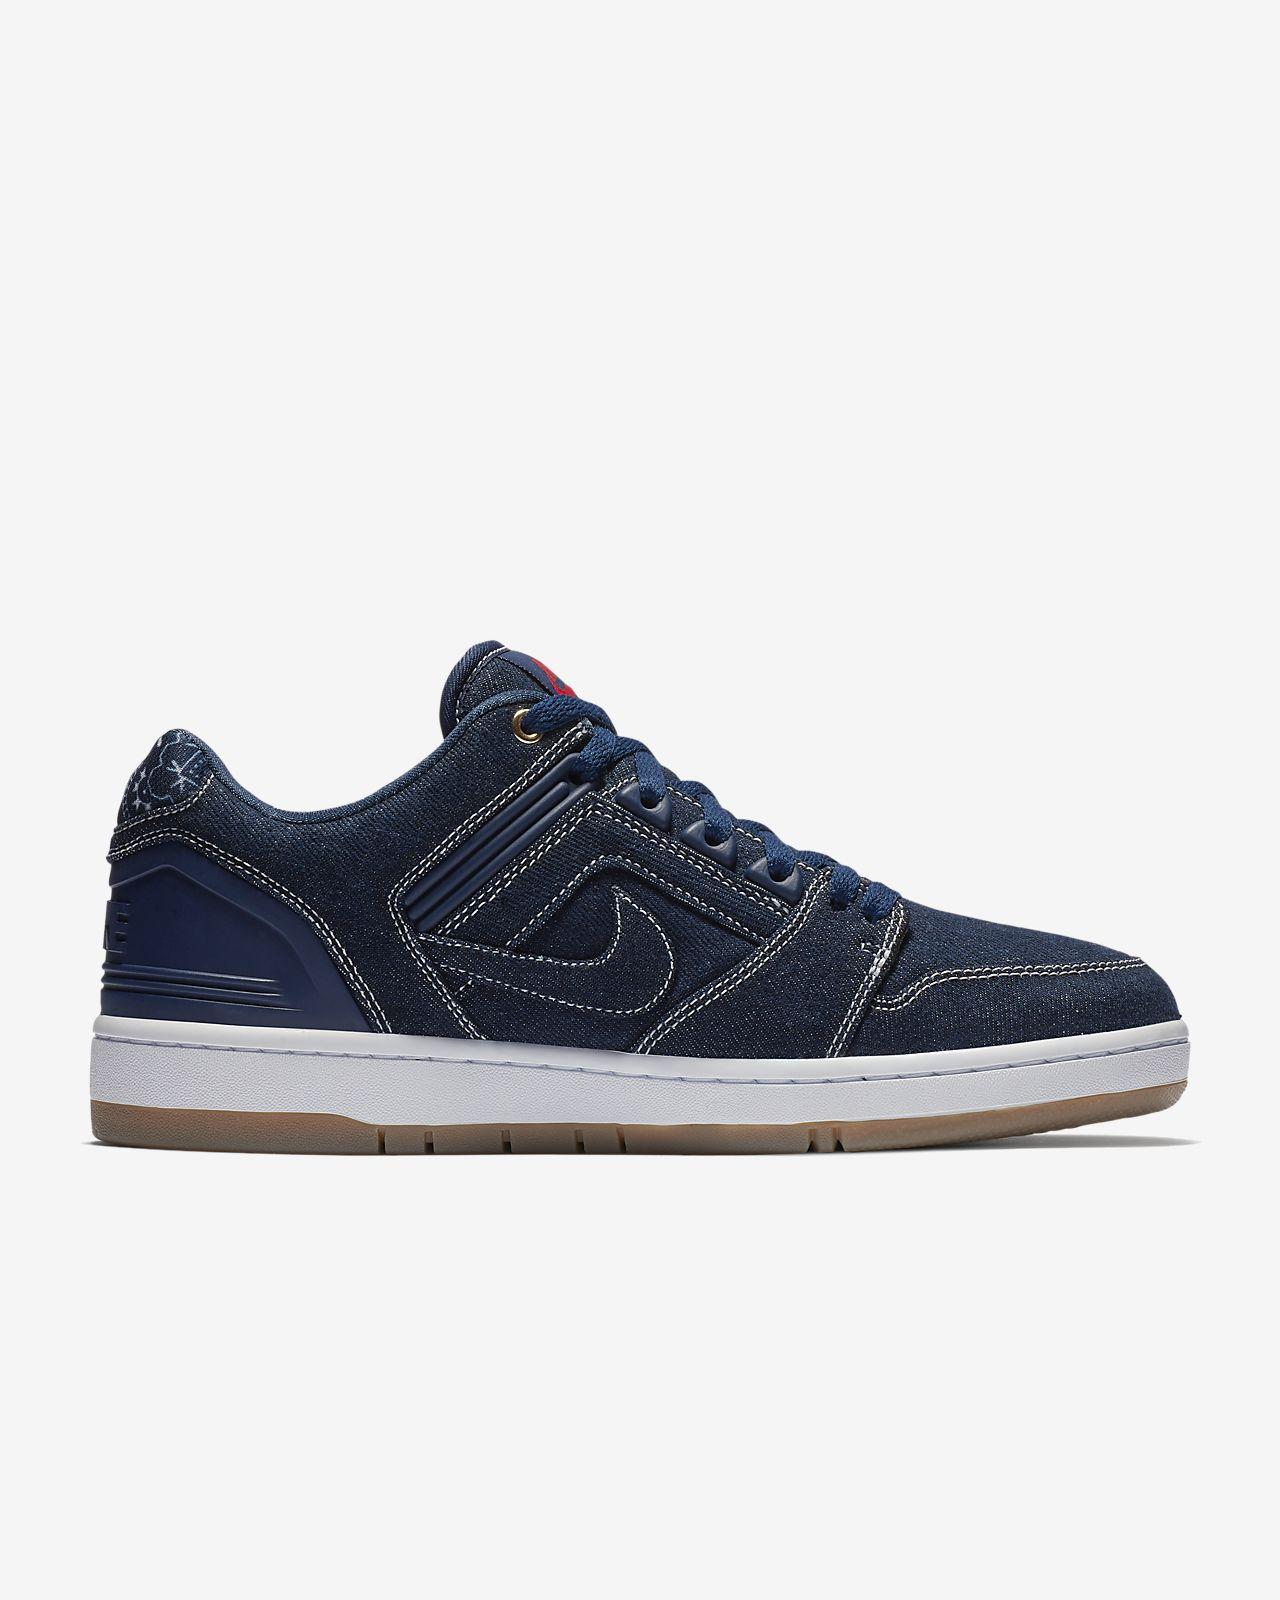 Nike SB Dunk Elite Low x Medicom Men's Lifestyle Shoes Black/White/Grey xF6916M